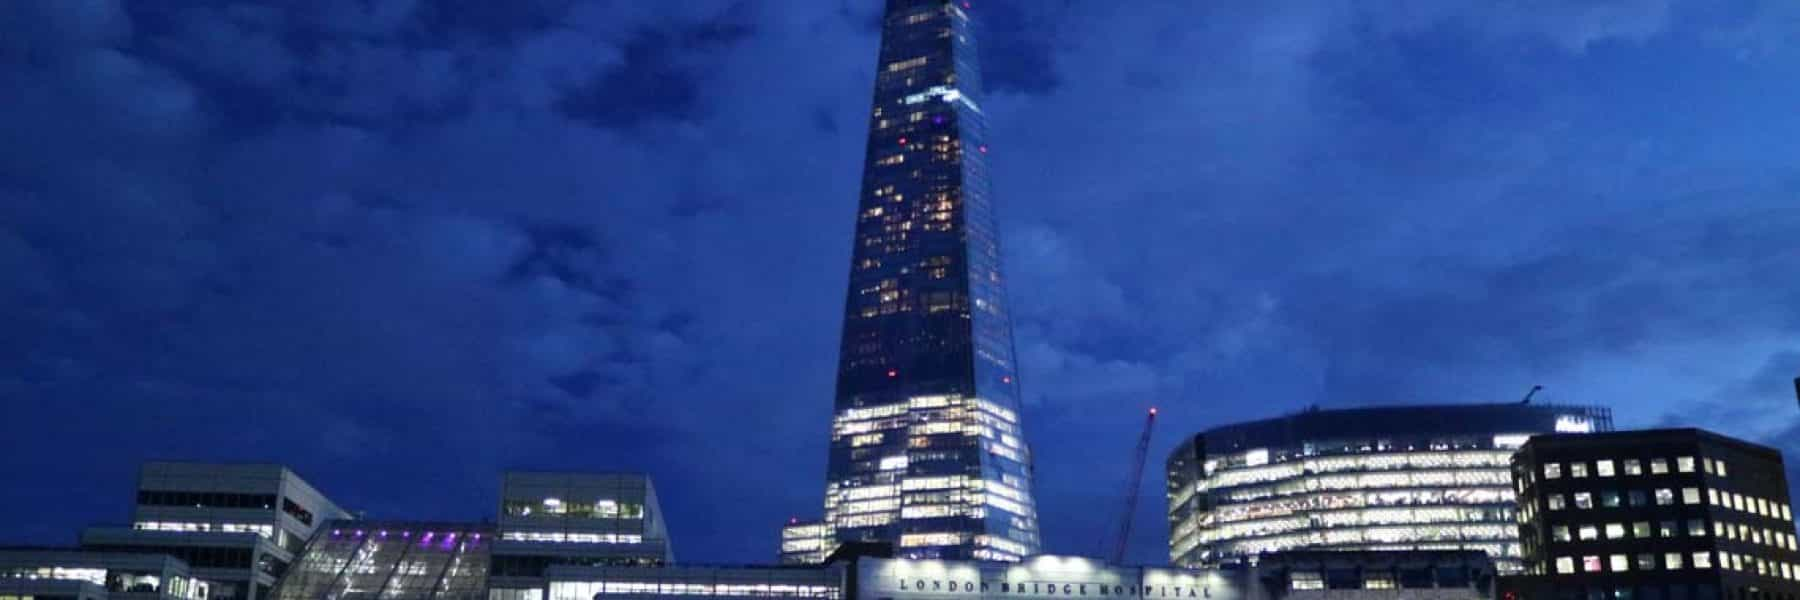 New Year's Eve Cruises, London Bridge City & The Shard | Viscount Cruises